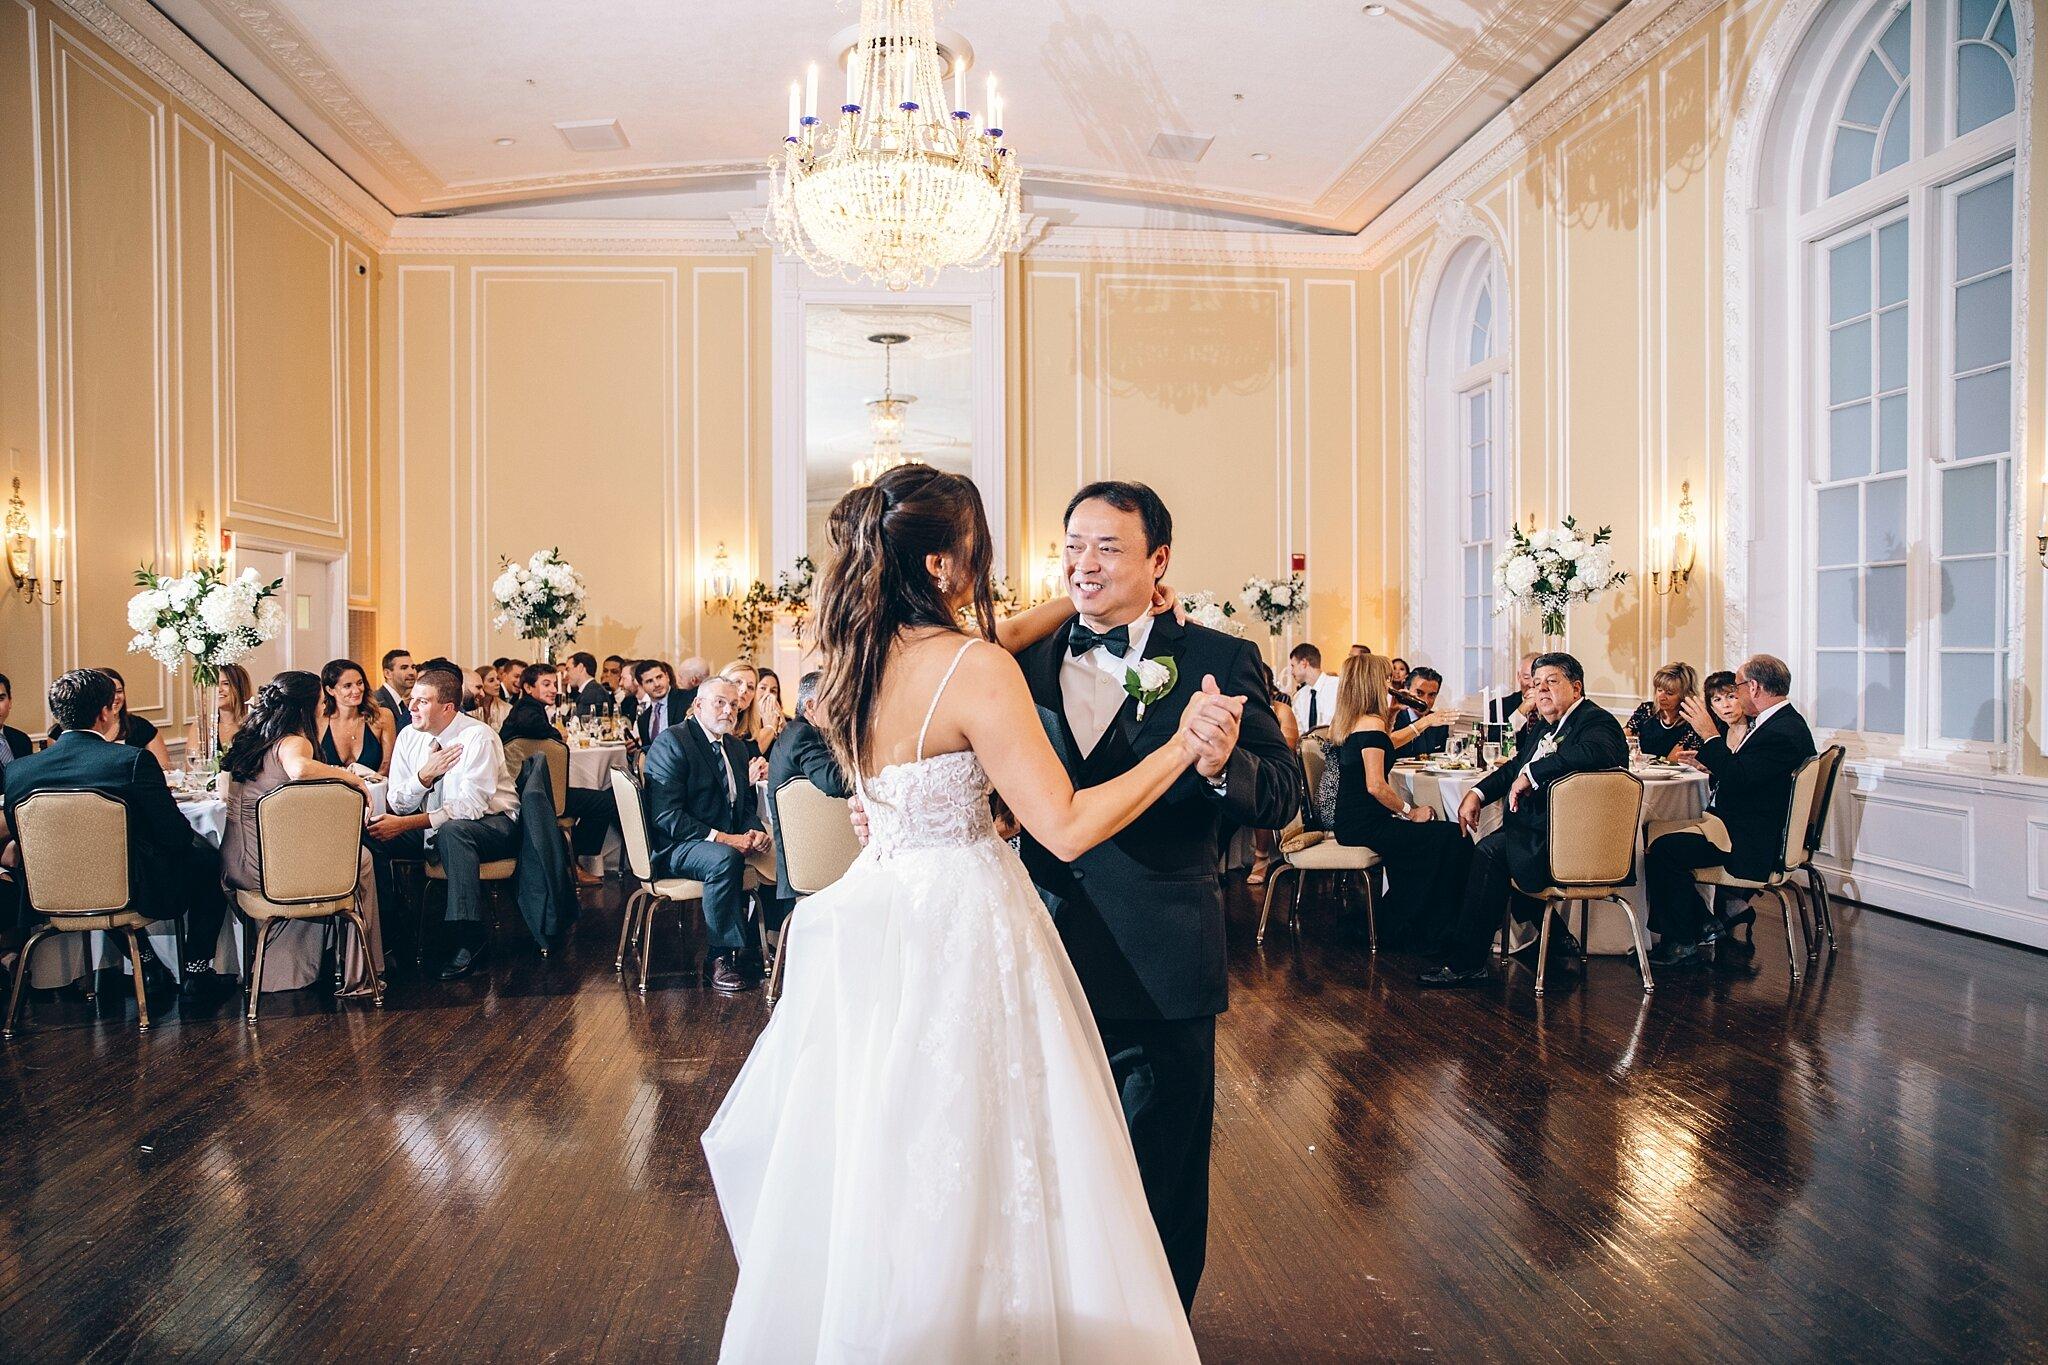 patrick-henry-ballroom-wedding-roanoke_0532.jpg